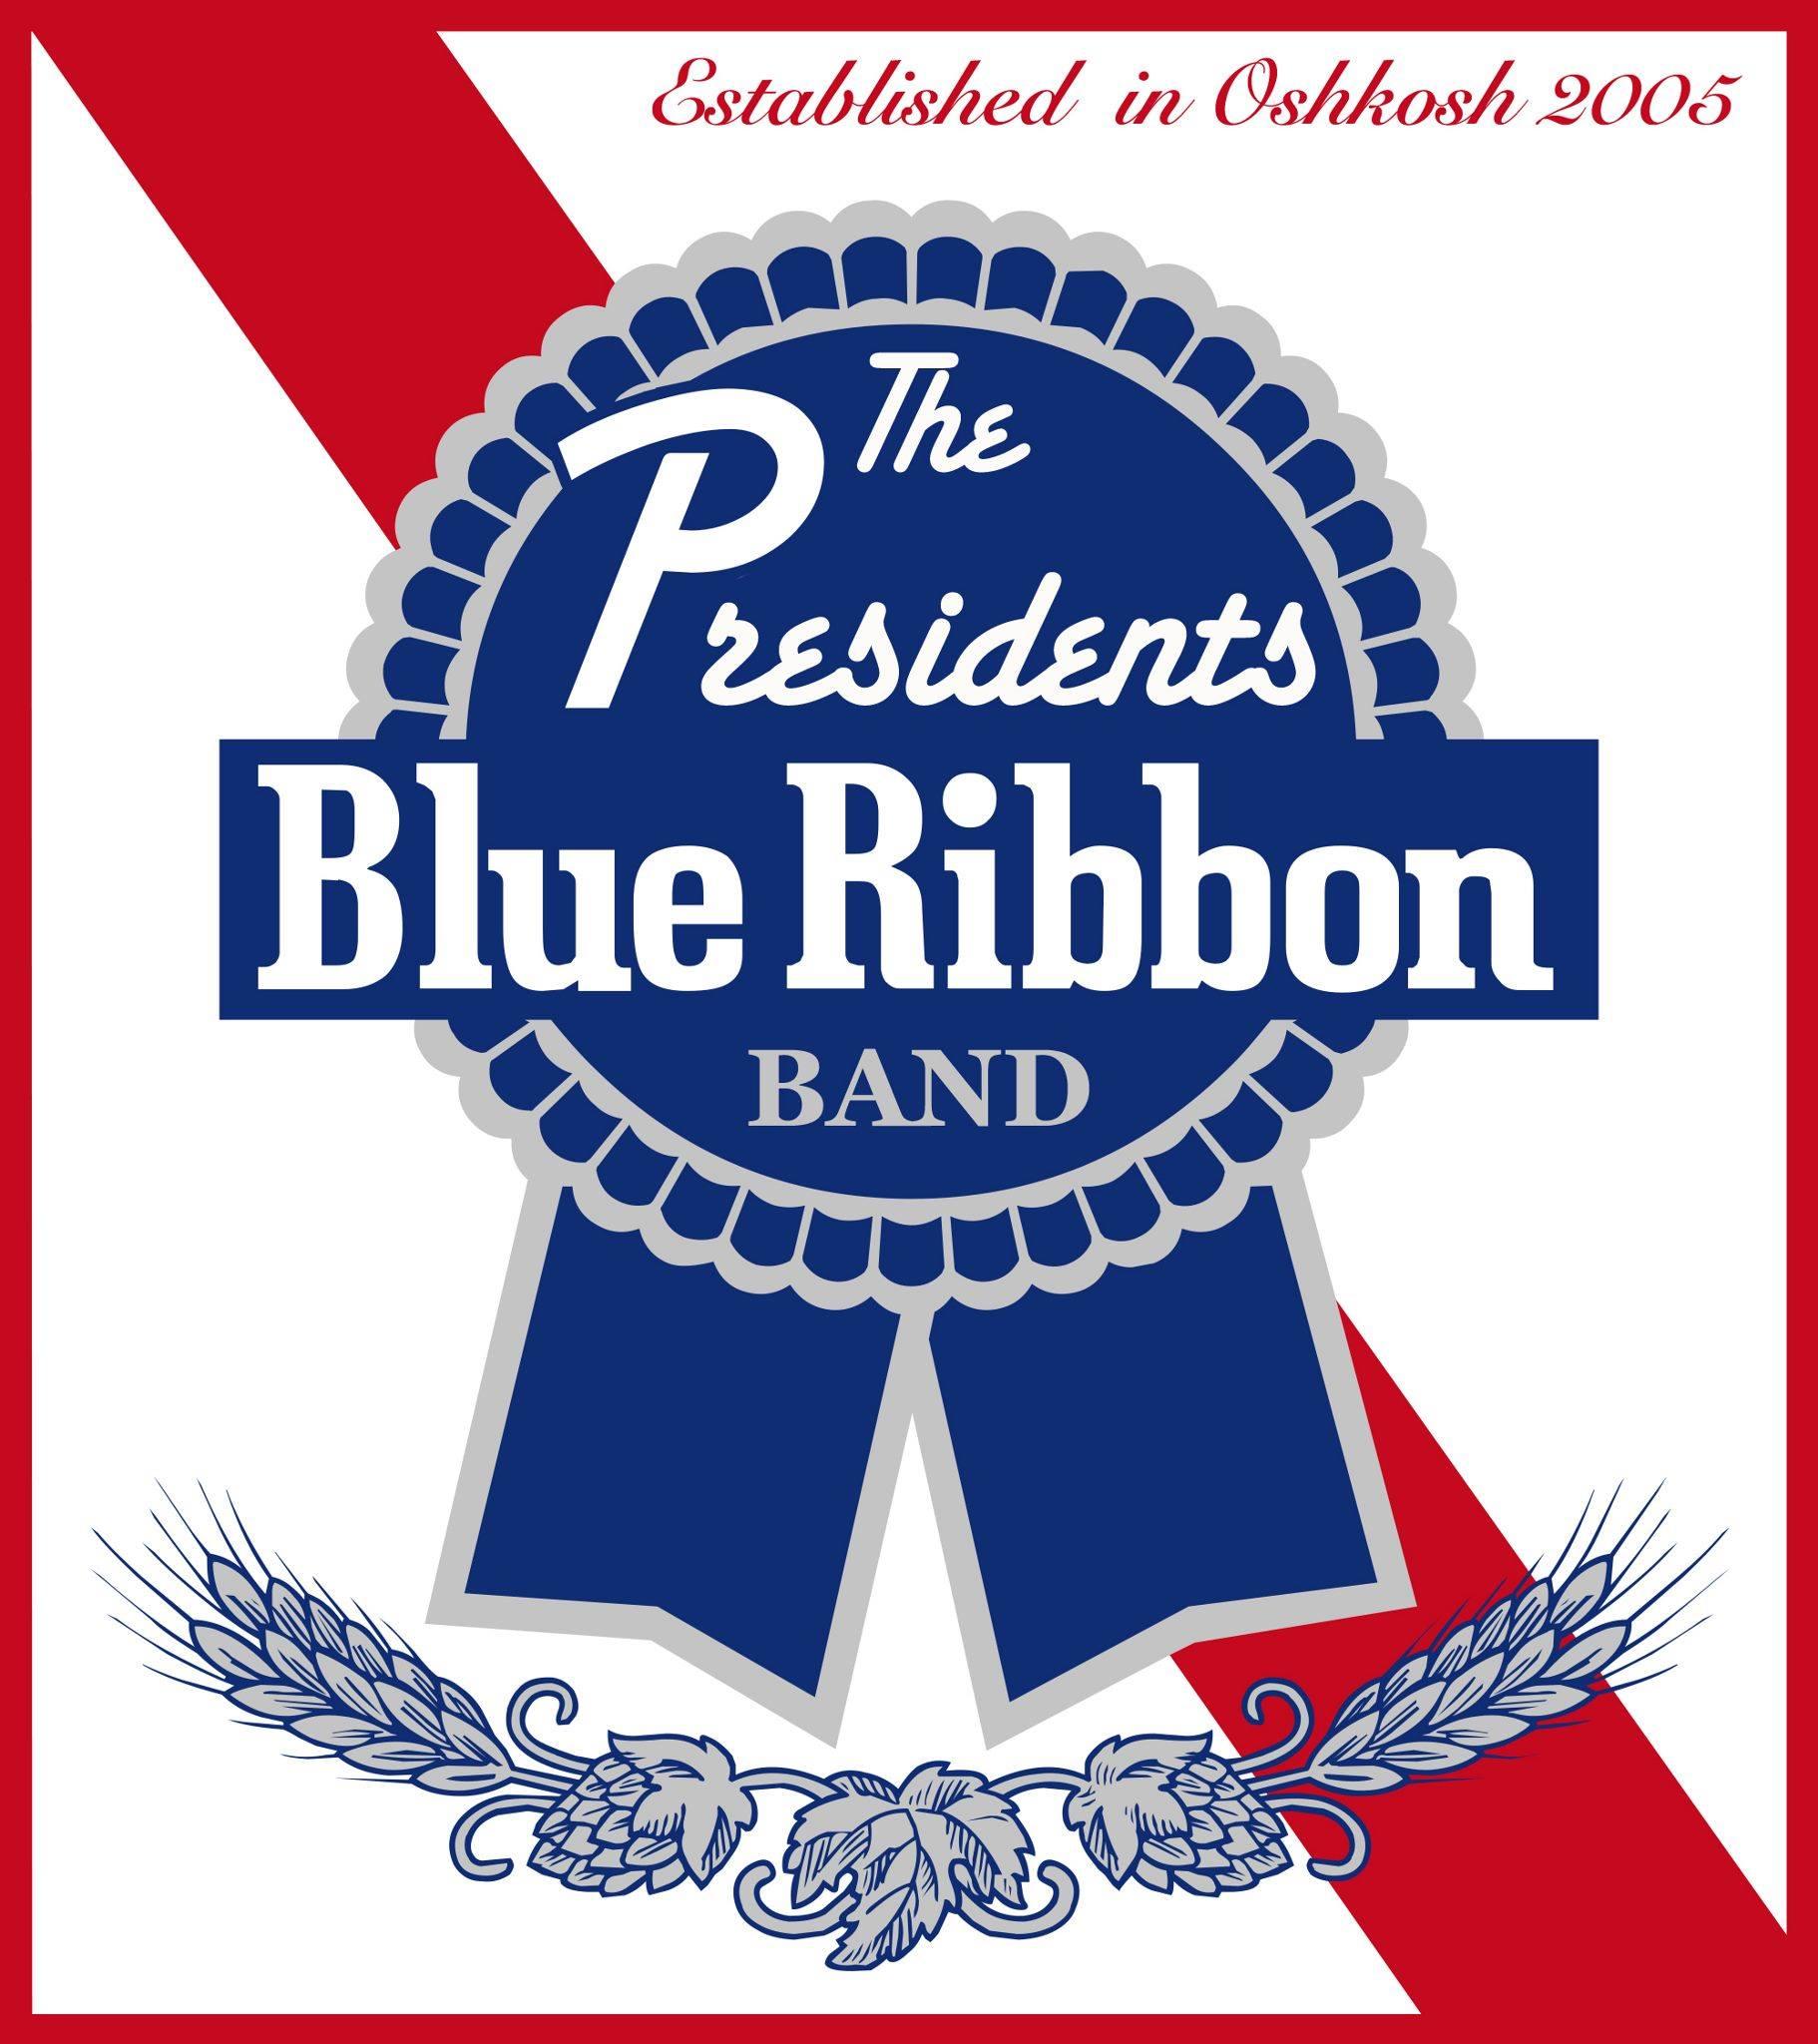 The president blue ribbon